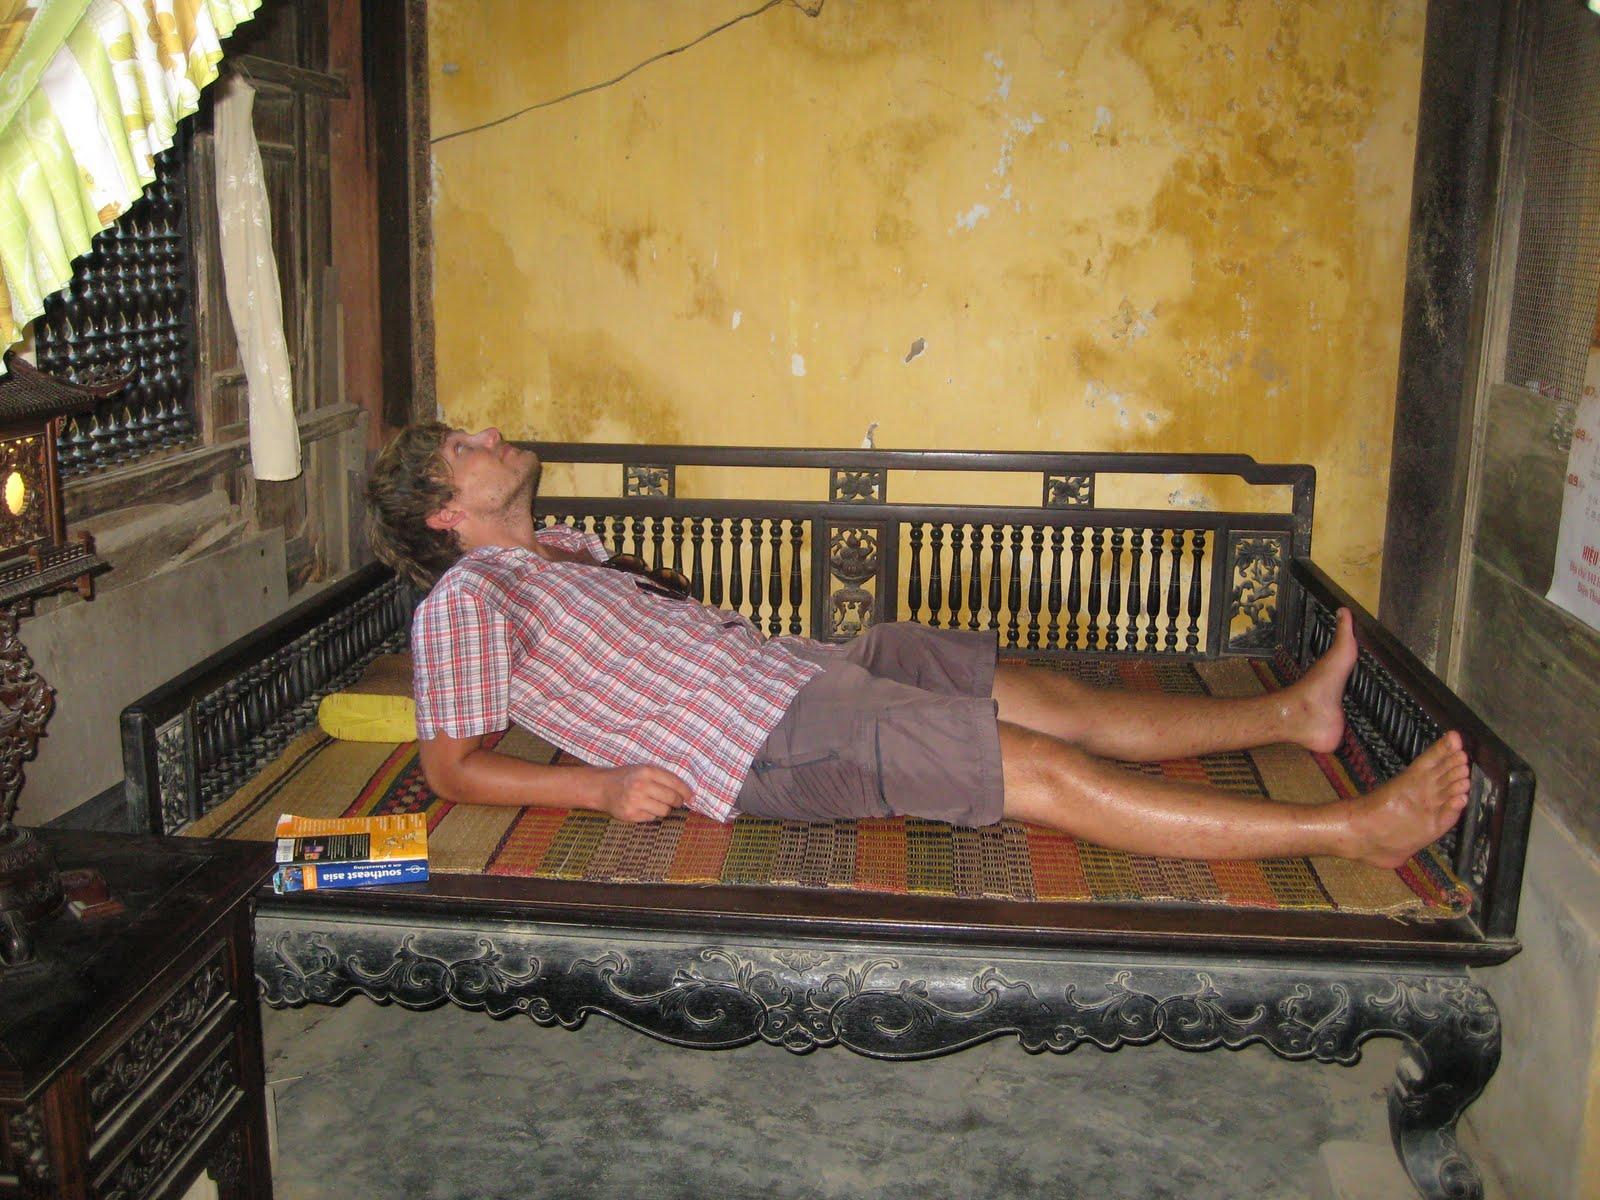 olantis sauna bdsm gedicht